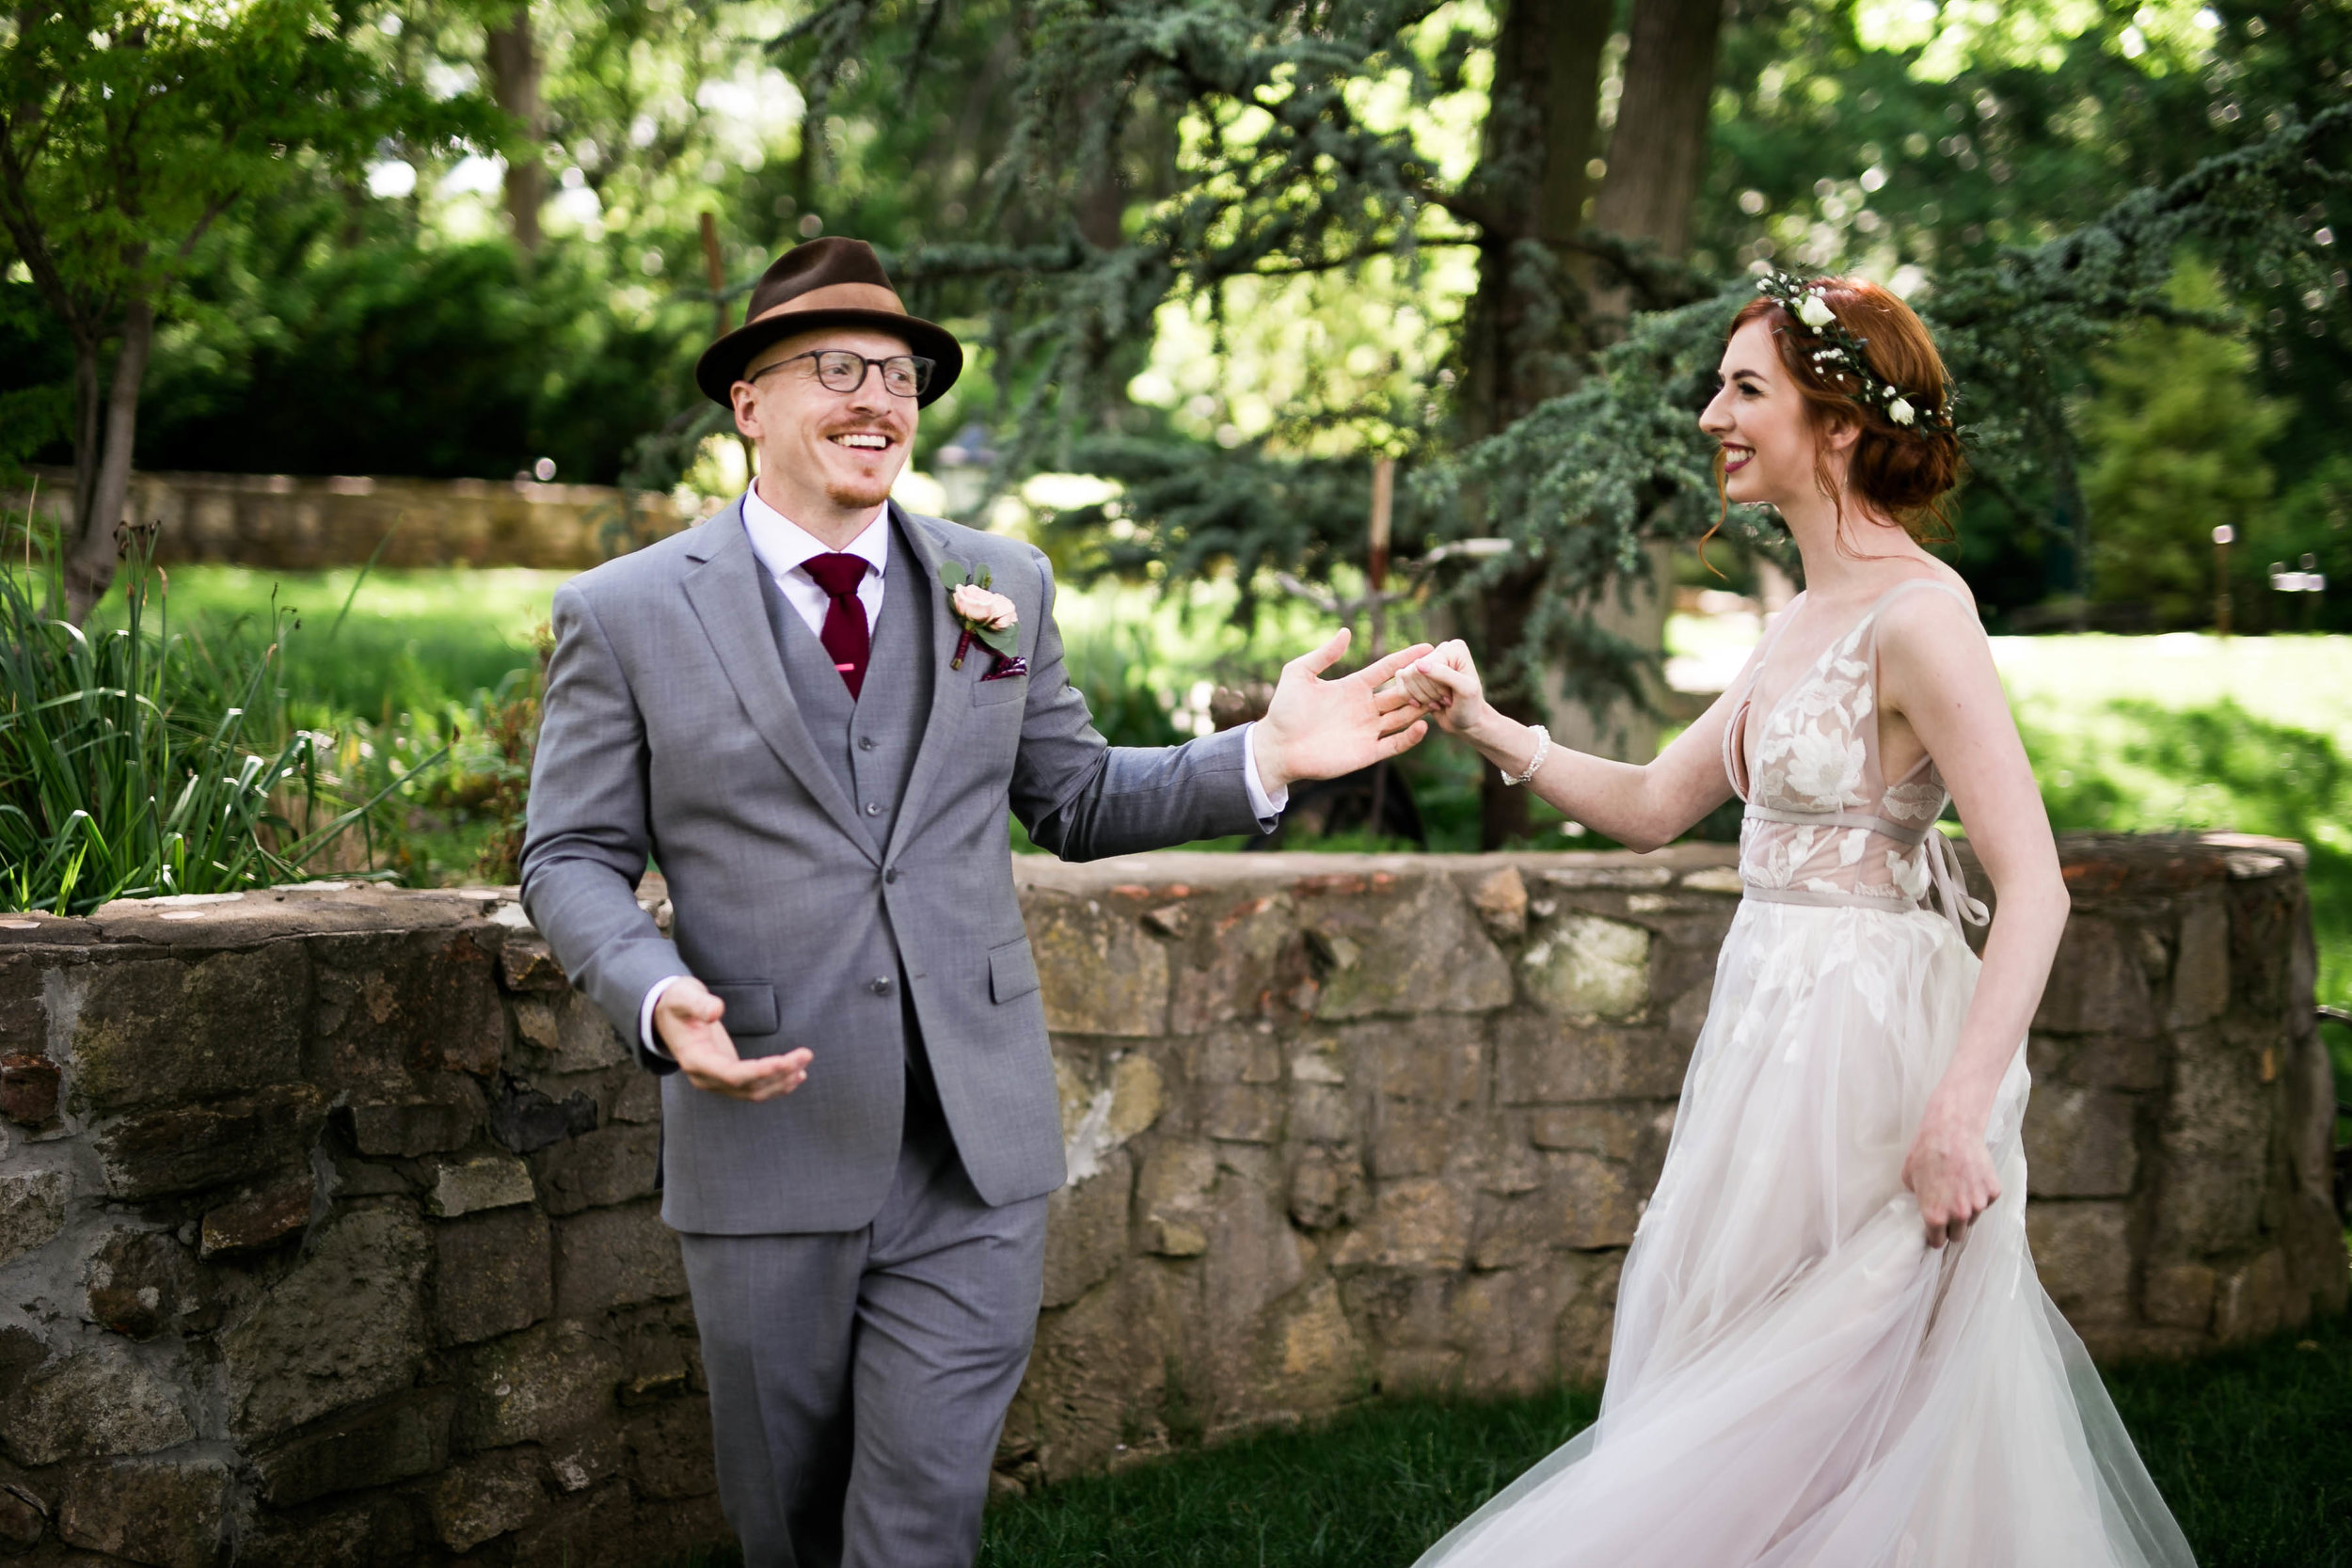 armstrong-wedding-197.jpg